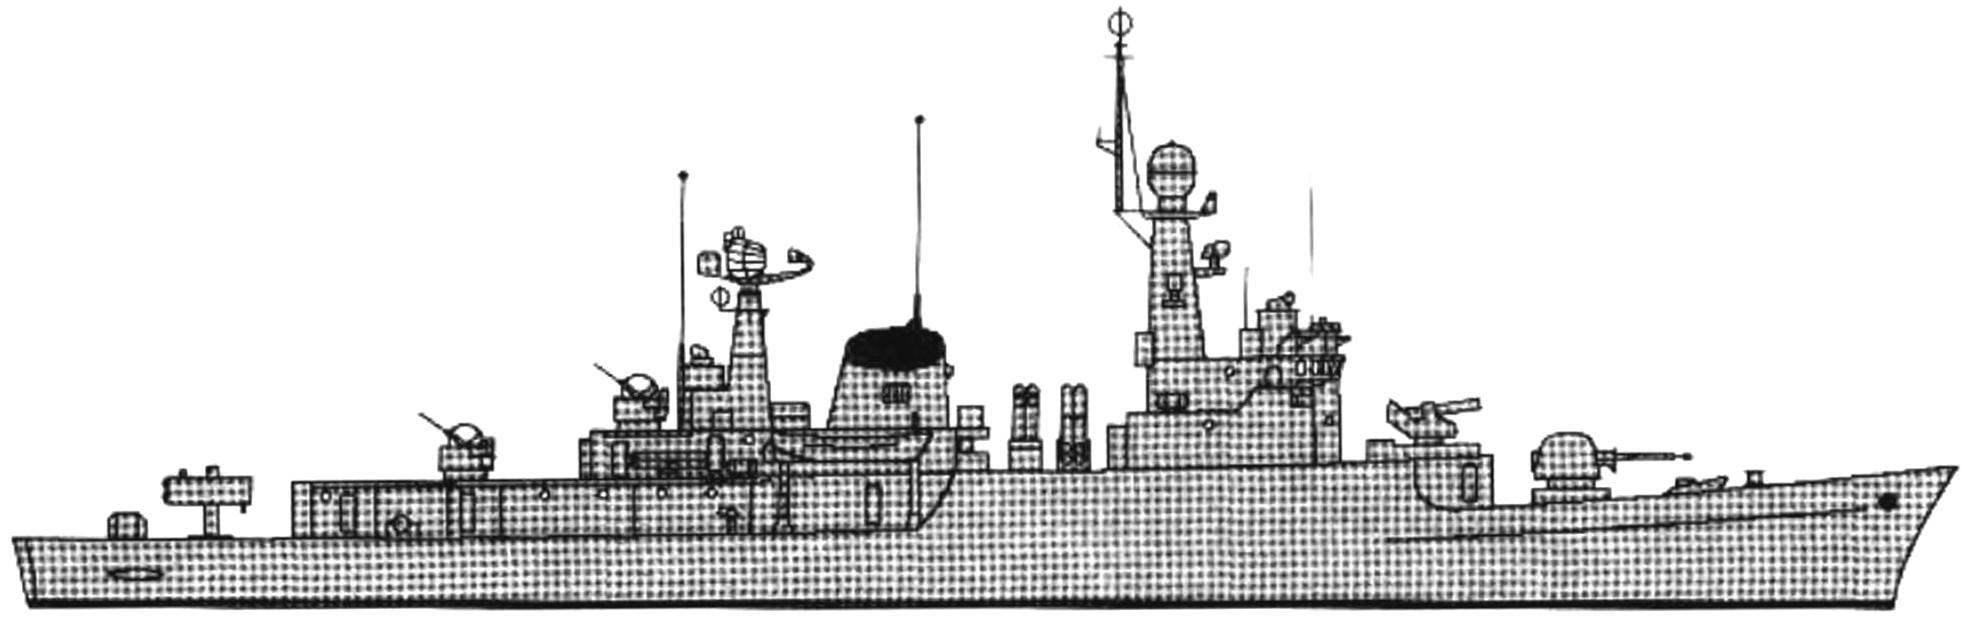 87. The frigate